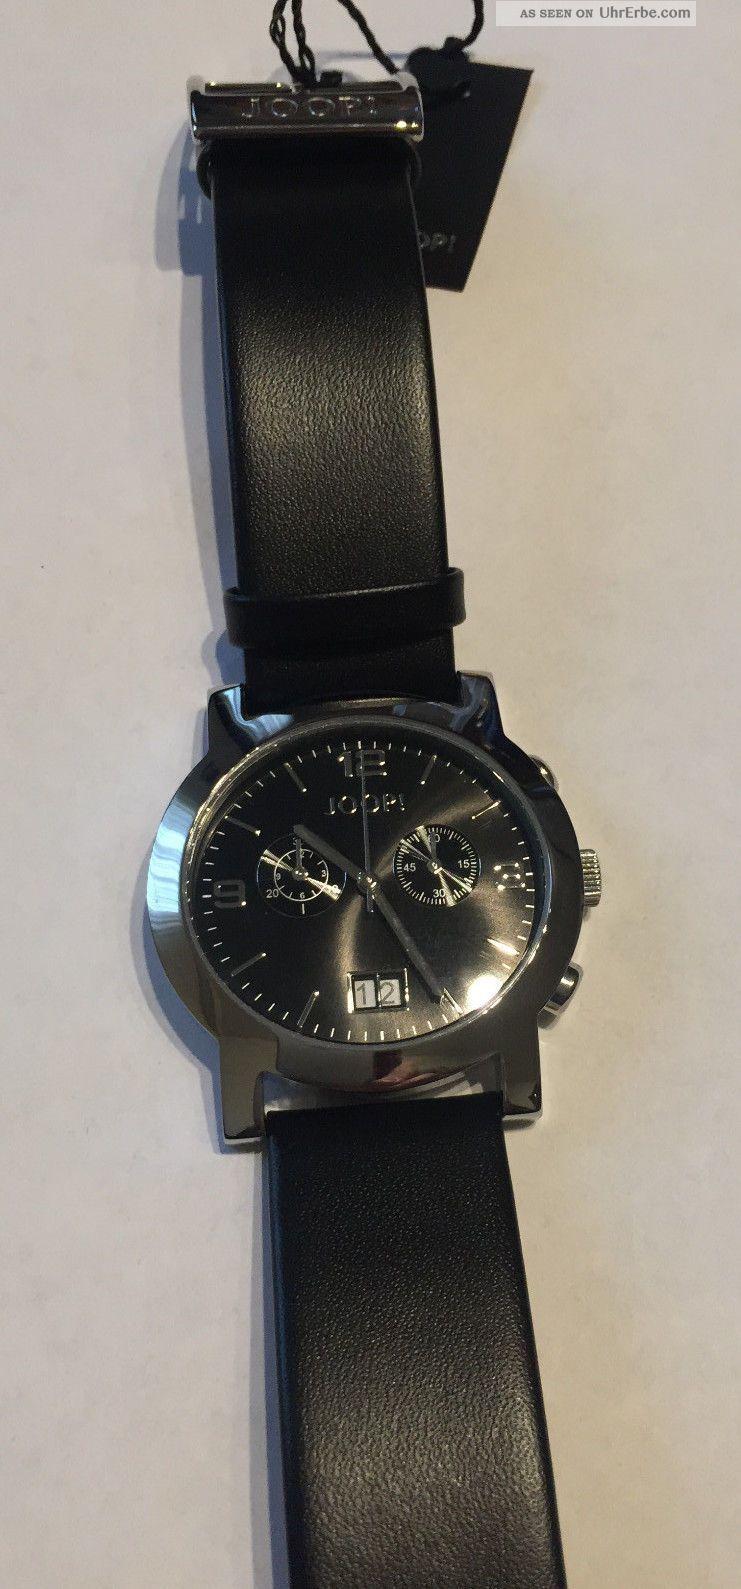 Joop Herrenuhr Edelstahl Lederband Schwarz Tm4391 Stoppuhr Armbanduhren Bild